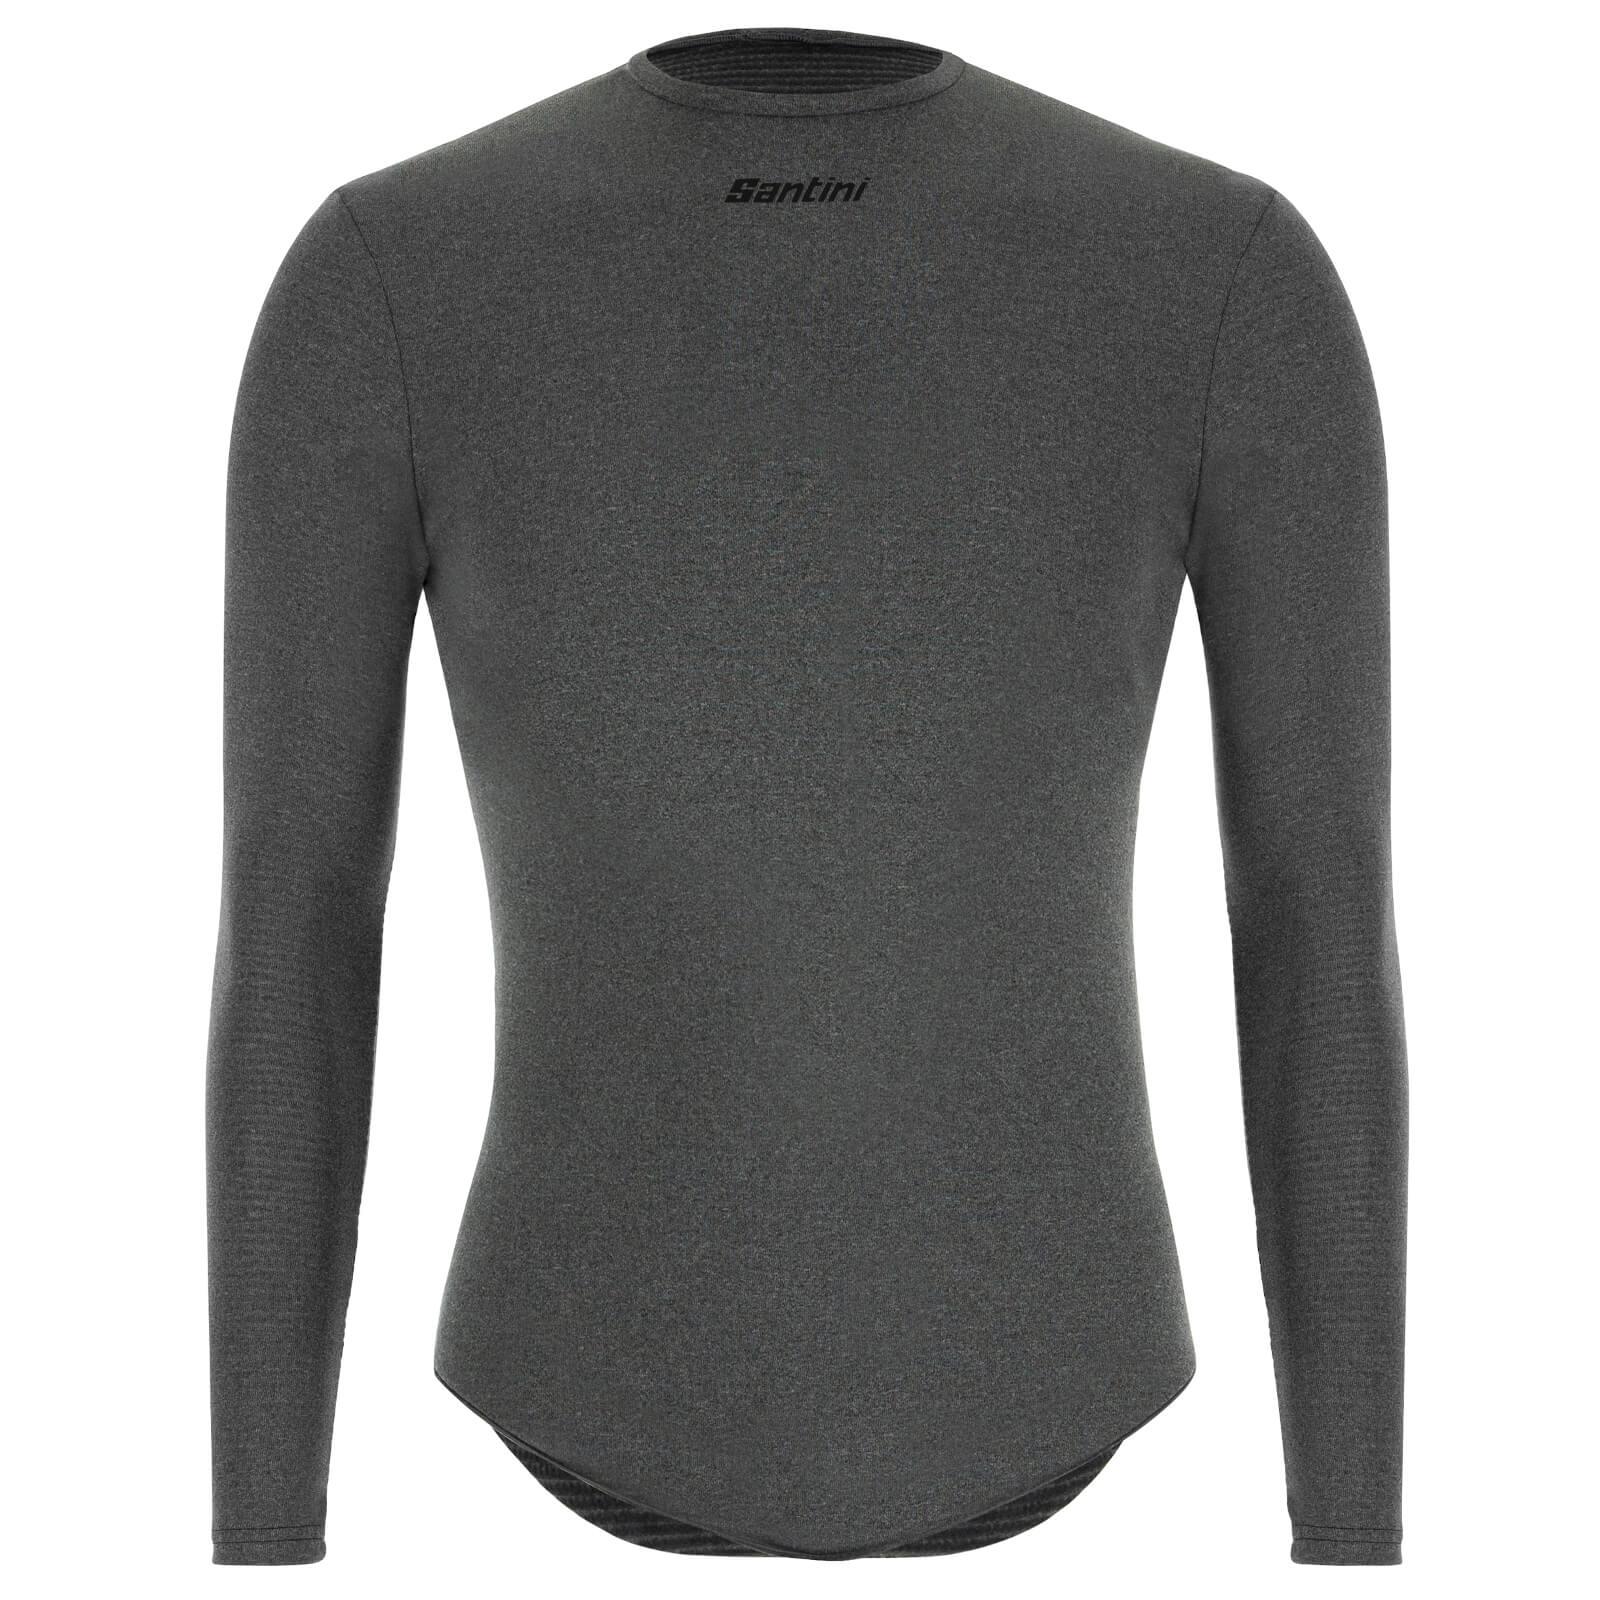 Santini Thermal Insulation Long Sleeve Baselayer - Grey - XS